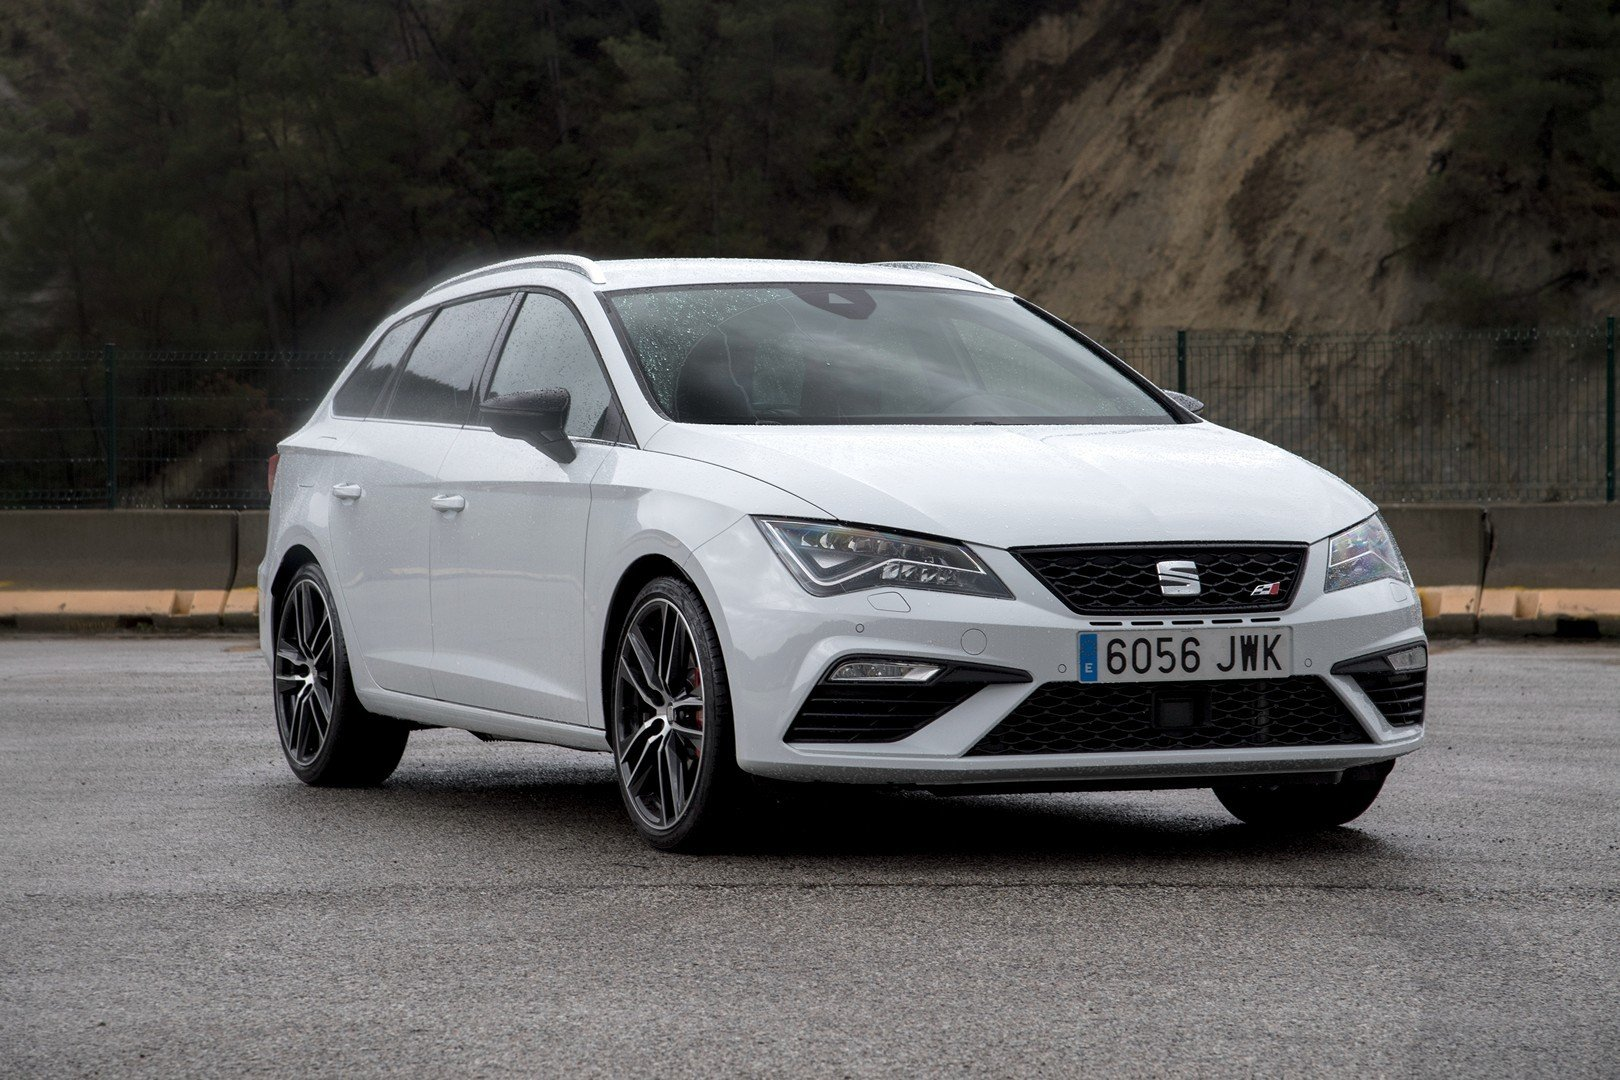 2017 Seat Leon Cupra 300